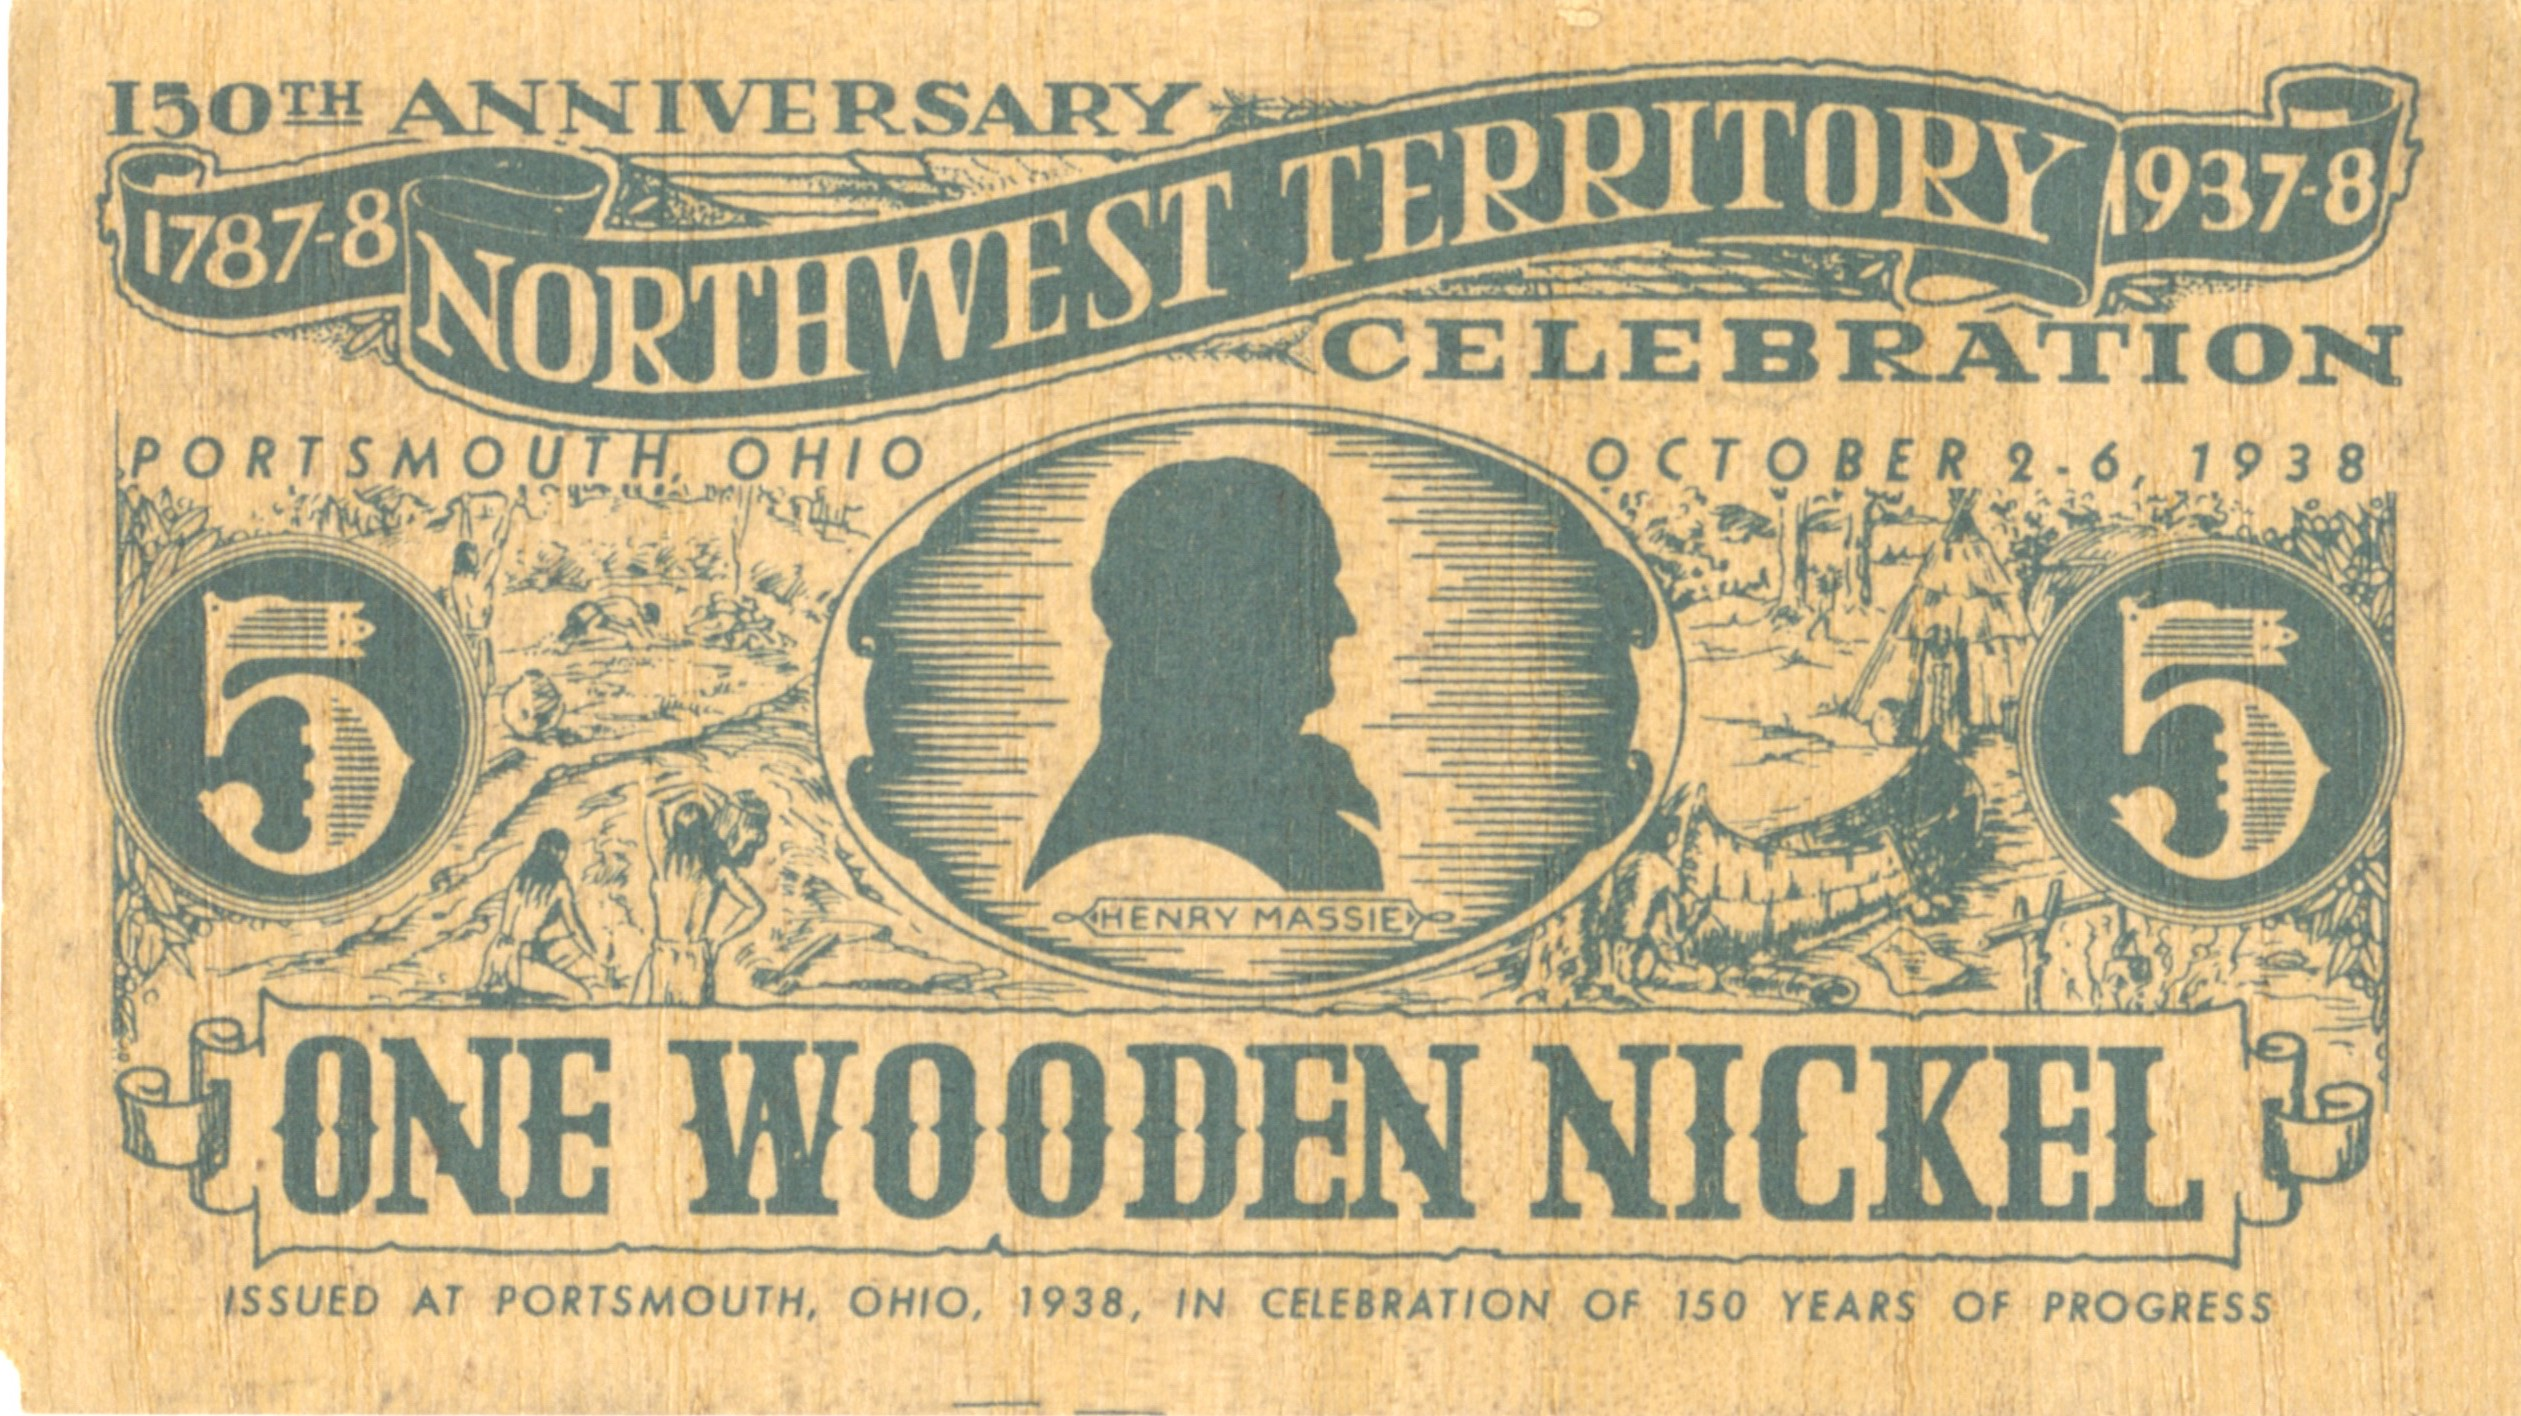 Northwest Territory Celebration Wooden Nickel 1937 38 Local